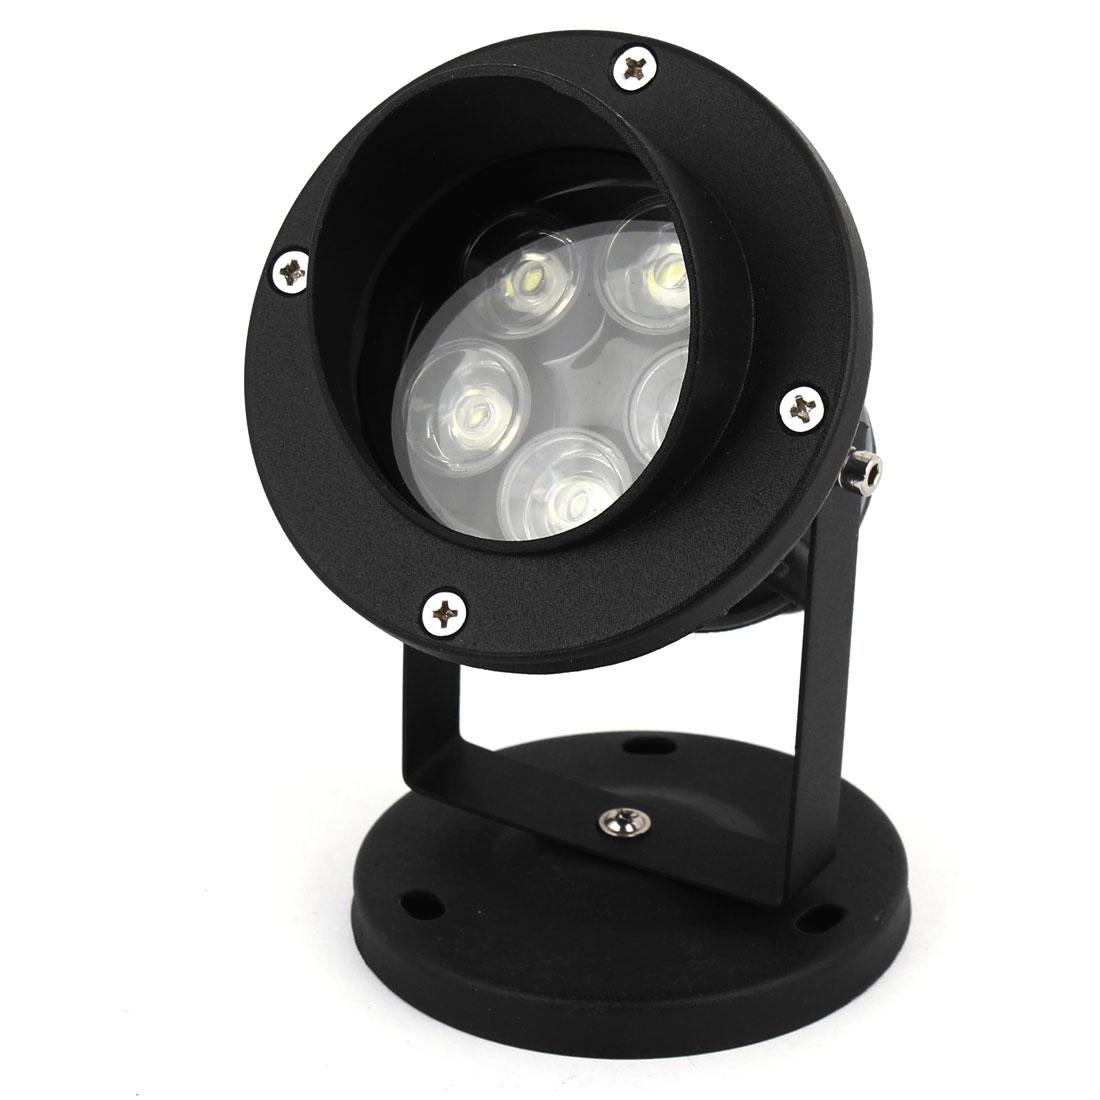 AC 12V 5W 500-550lm 3 LEDs Green Light Spotlight Downlight Lamp